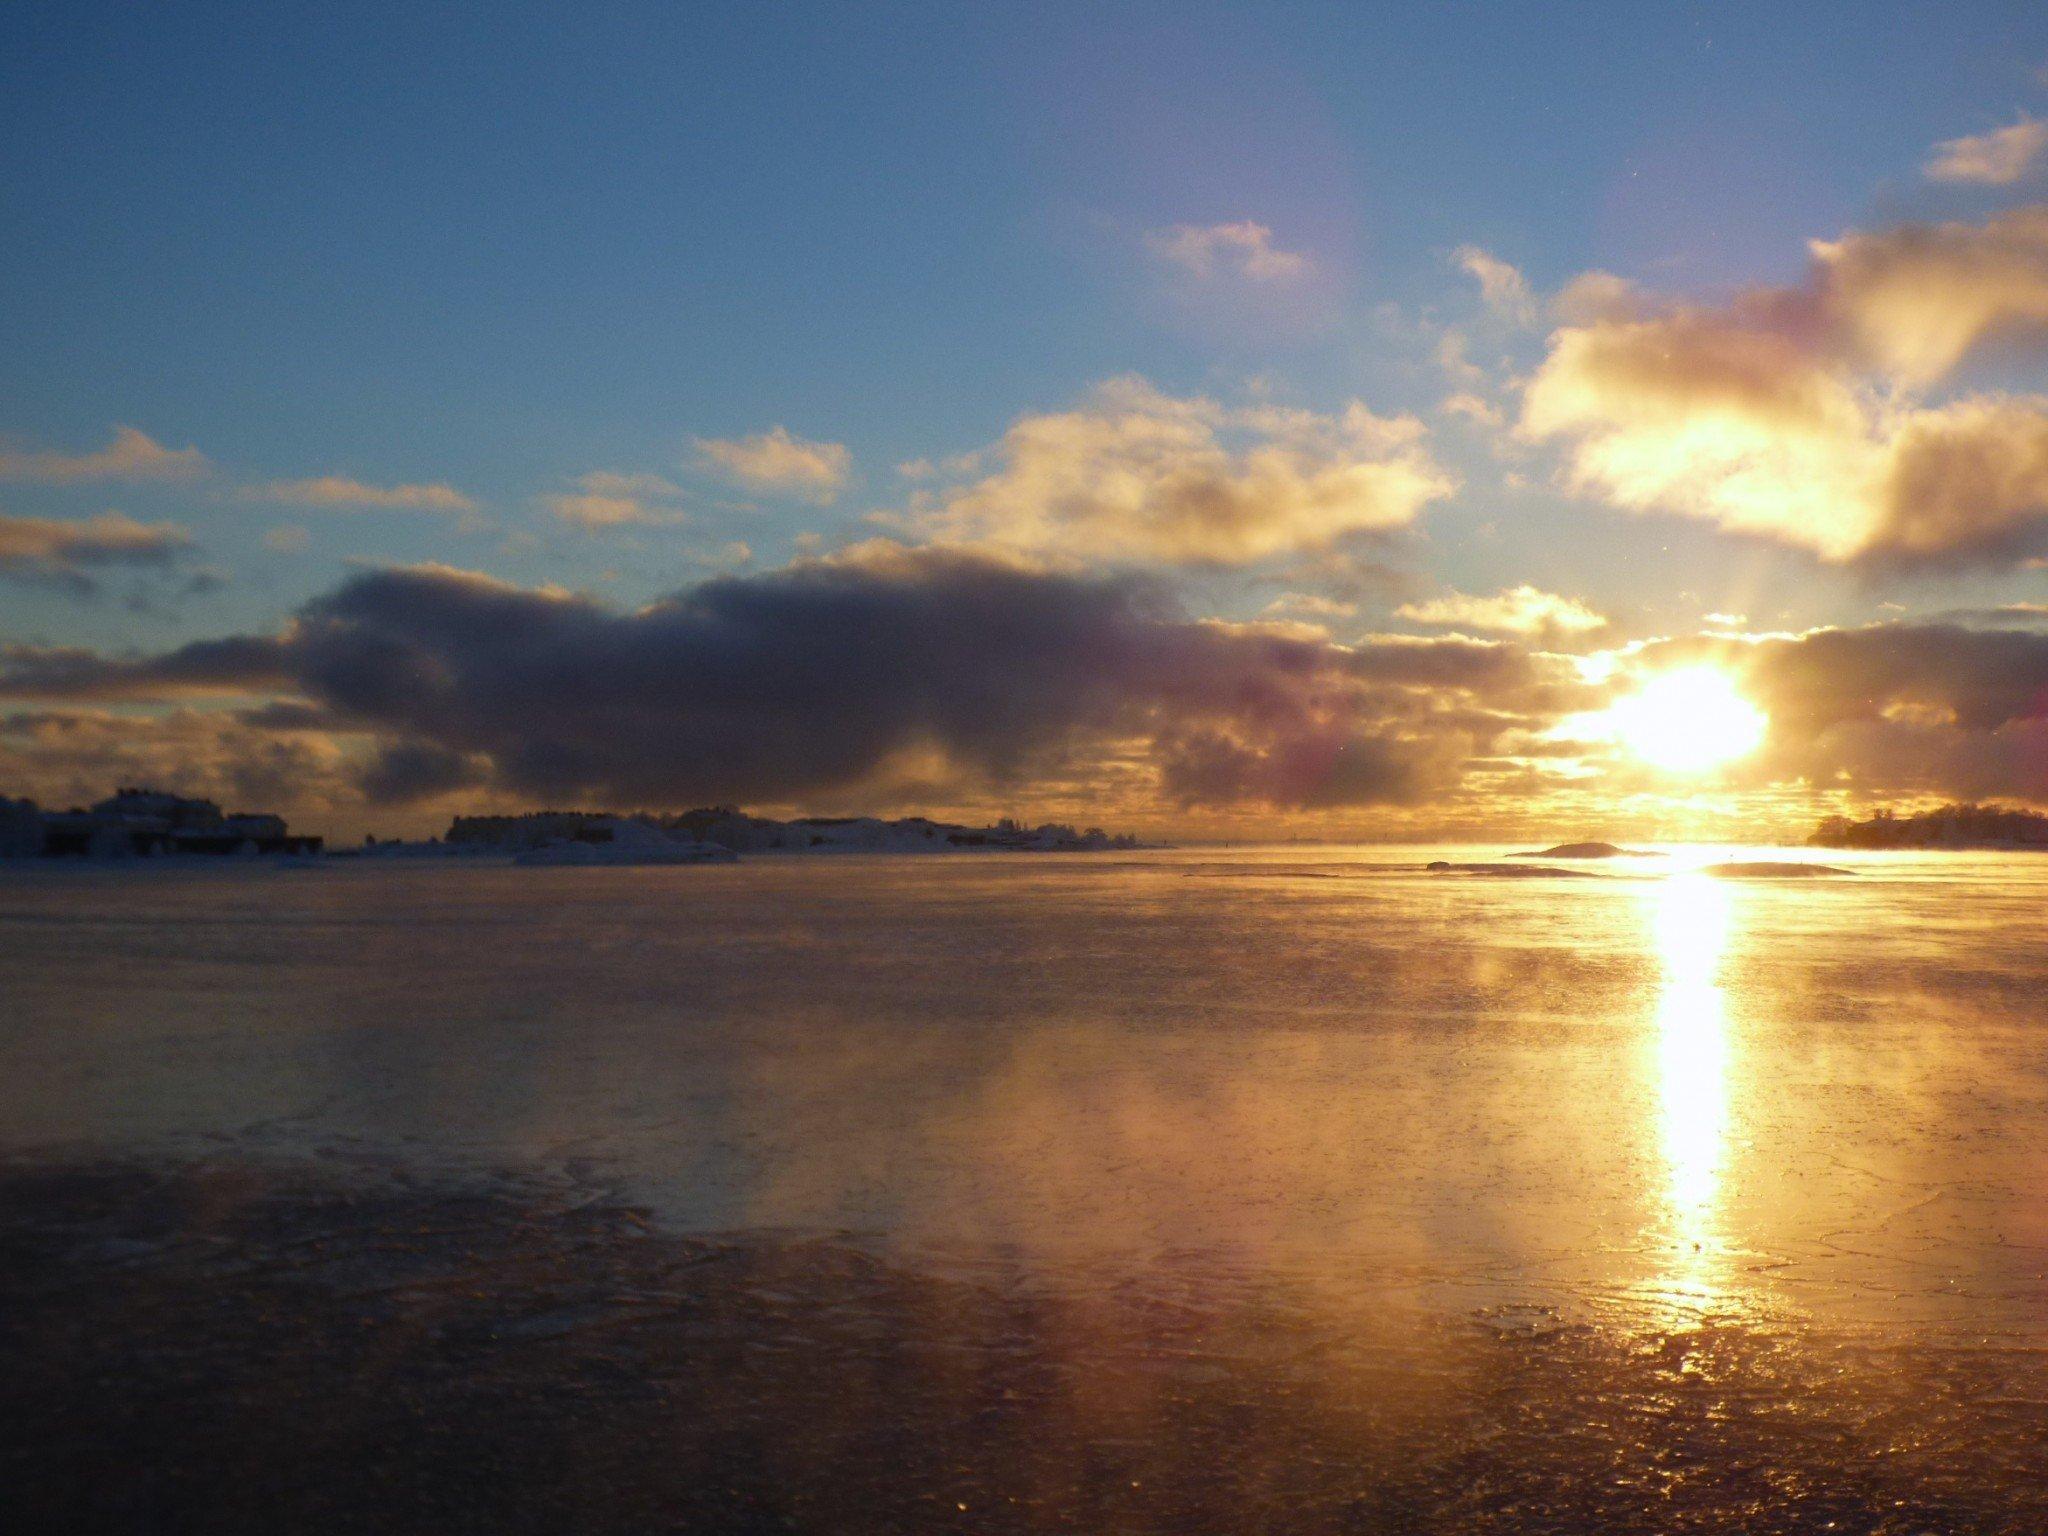 Suomenlinnan lautta auringonlasku